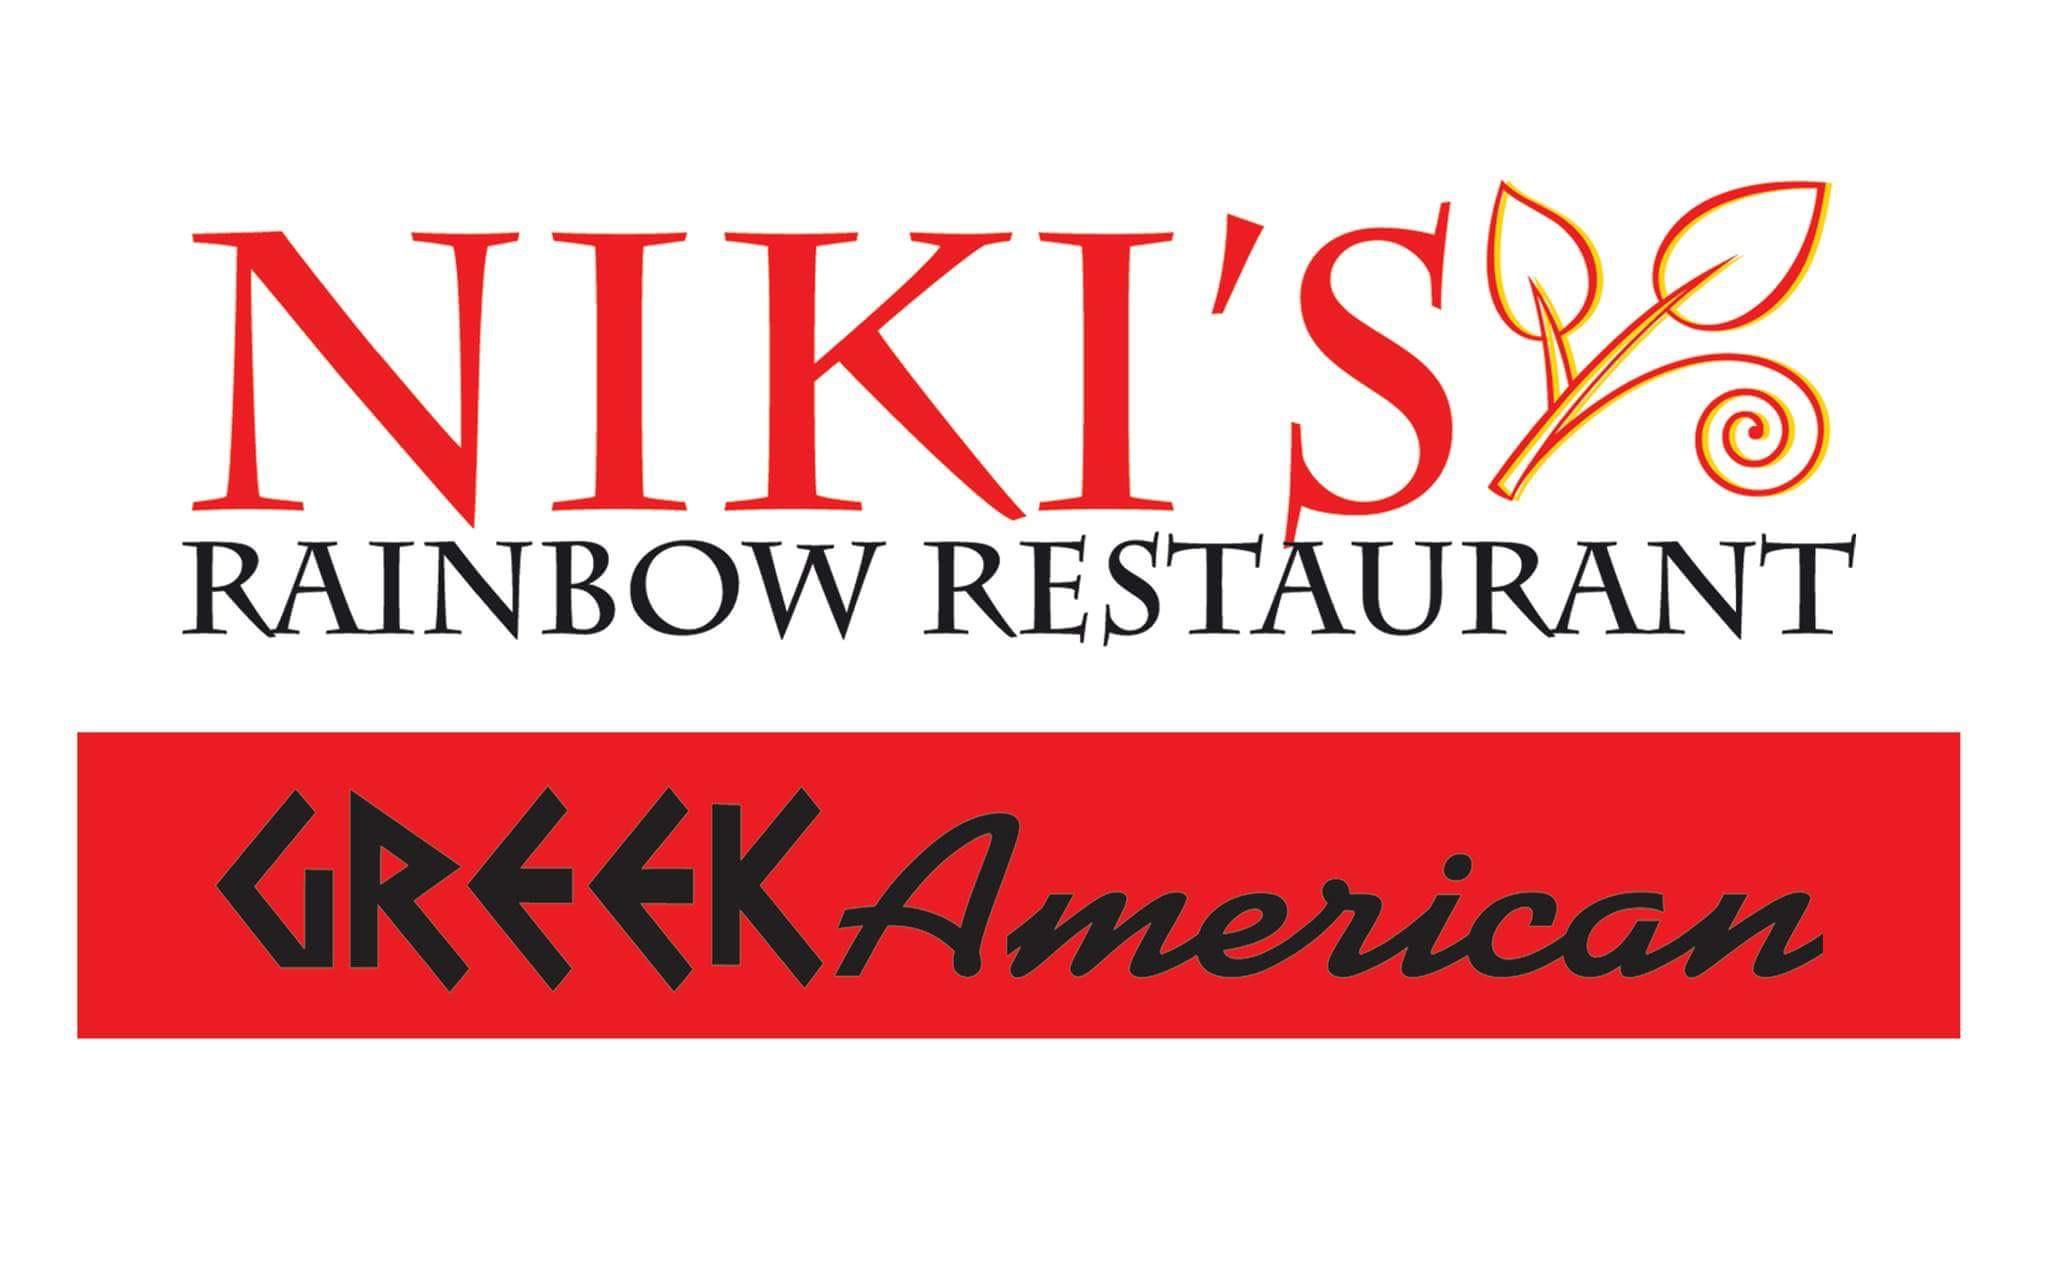 Niki's Rainbow Restaurant